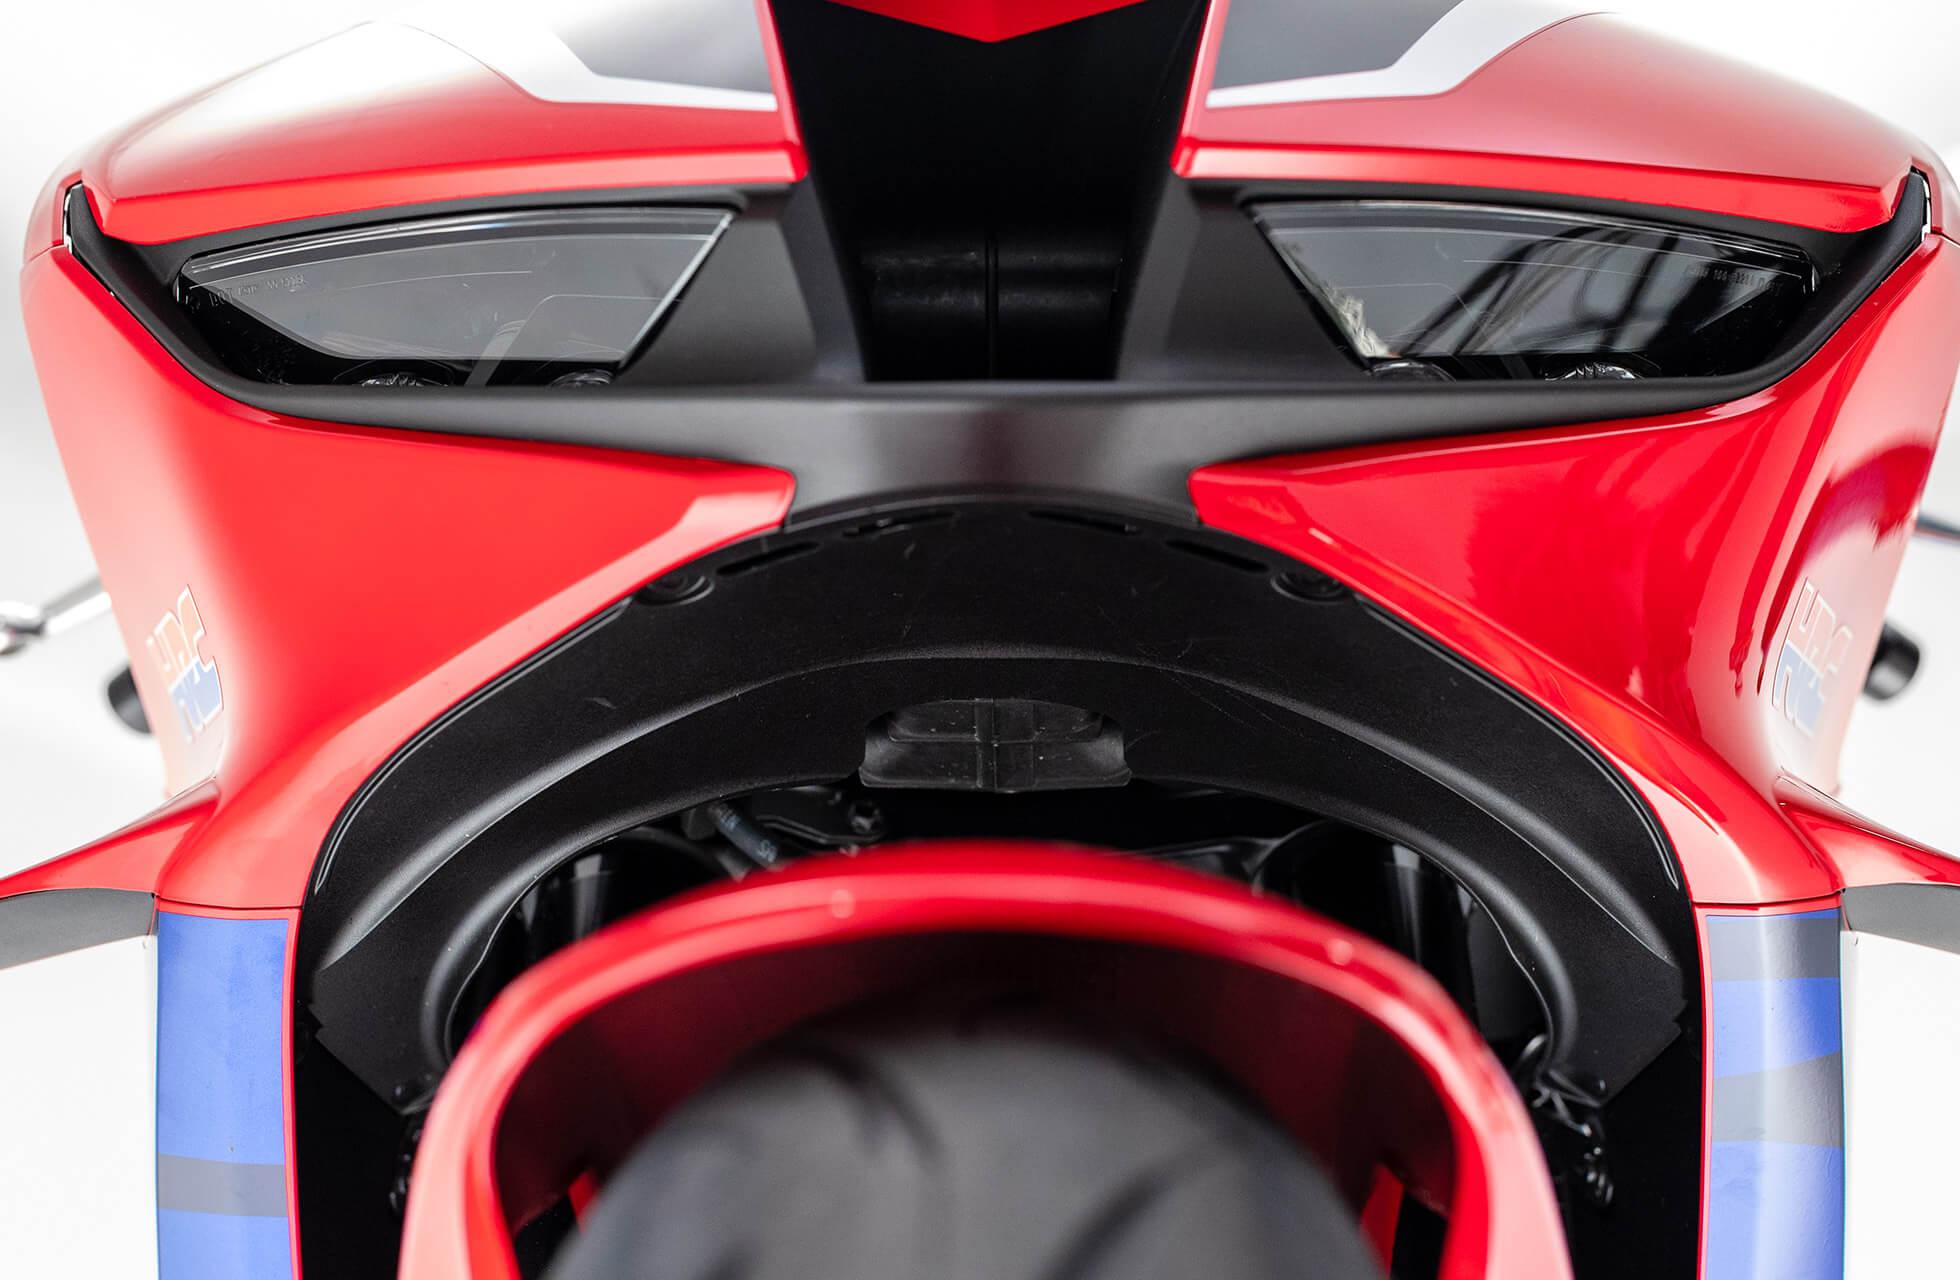 2021 - 2022 Honda CBR600RR Changes Explained! | New Motorcycle & Sportbike Reviews, Specs, News etc